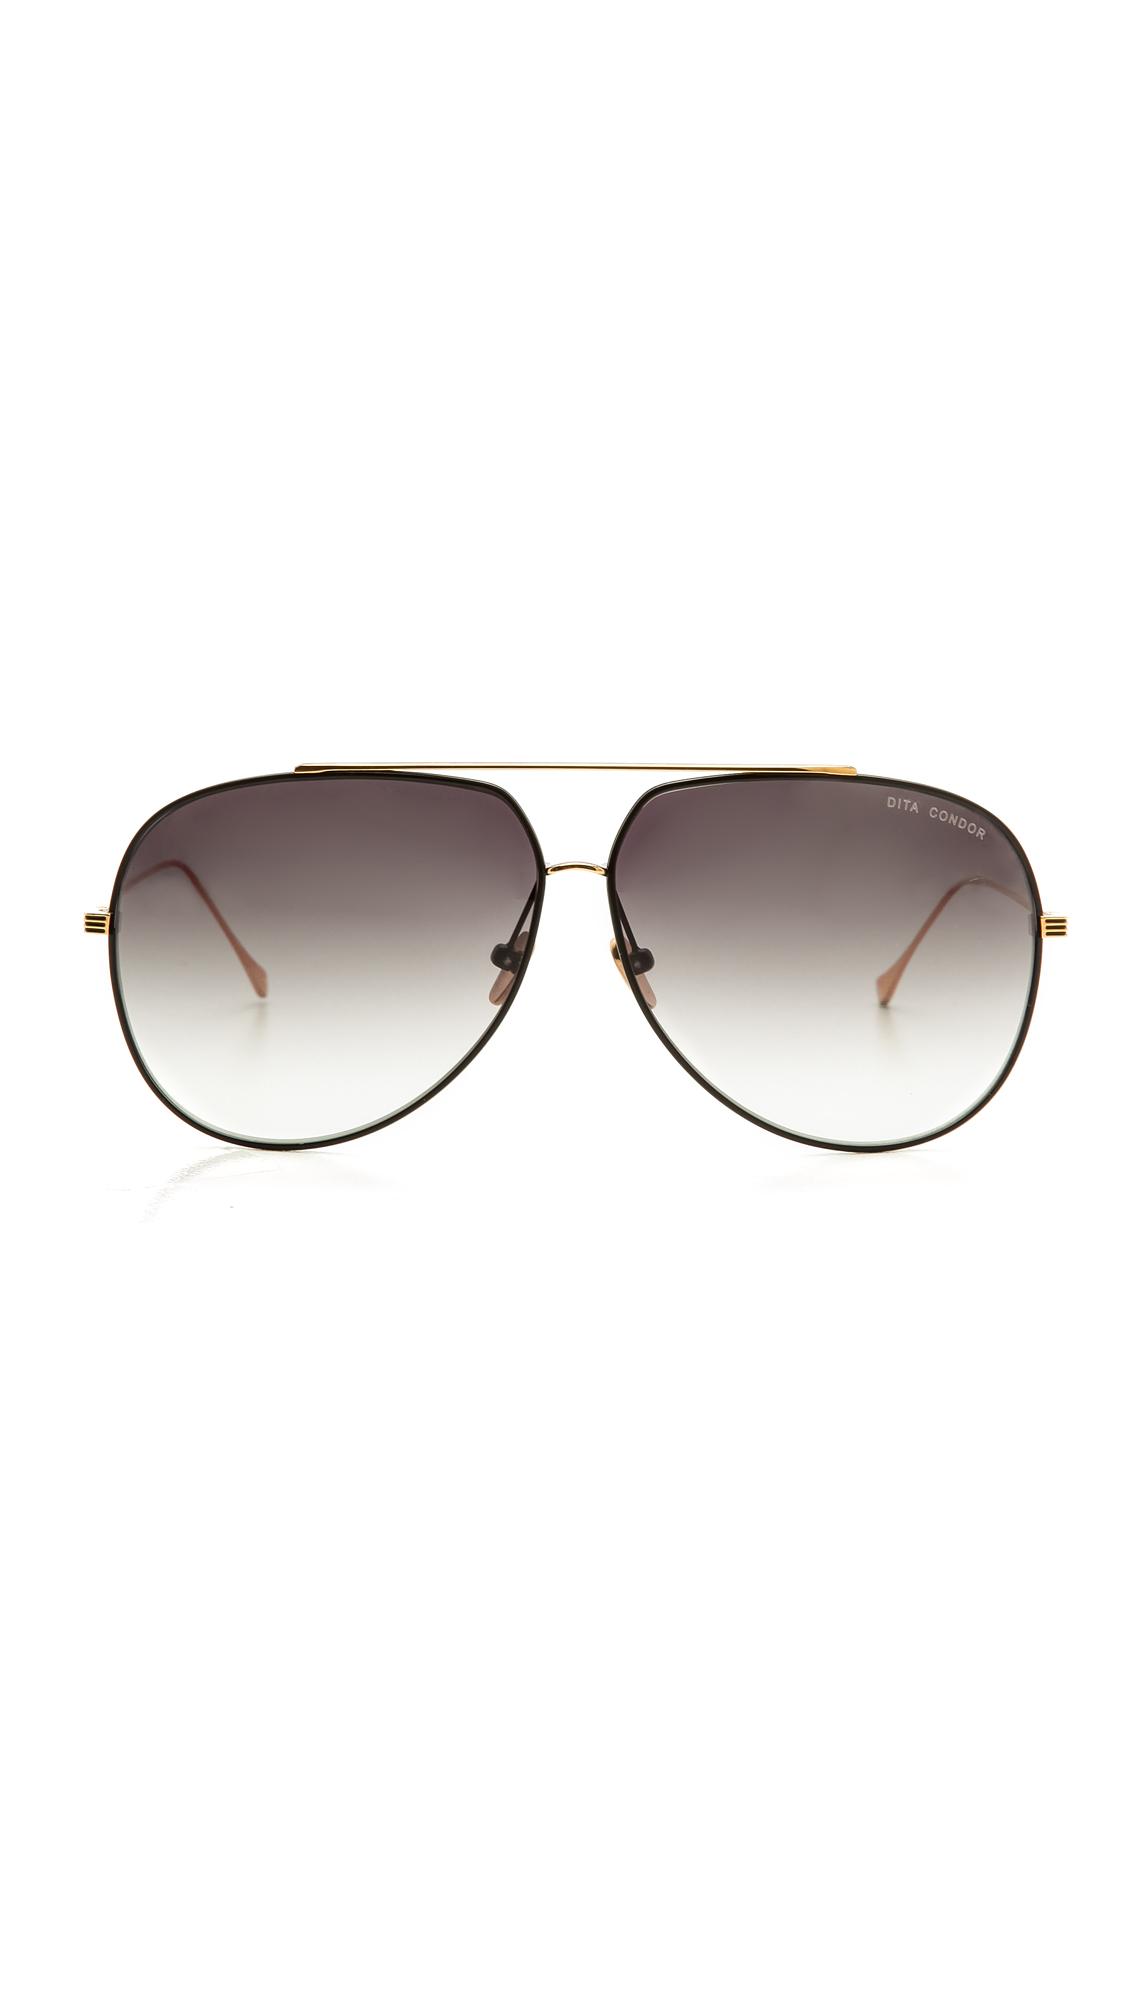 8b6cfcdfa2d5 DITA Condor Aviator Sunglasses